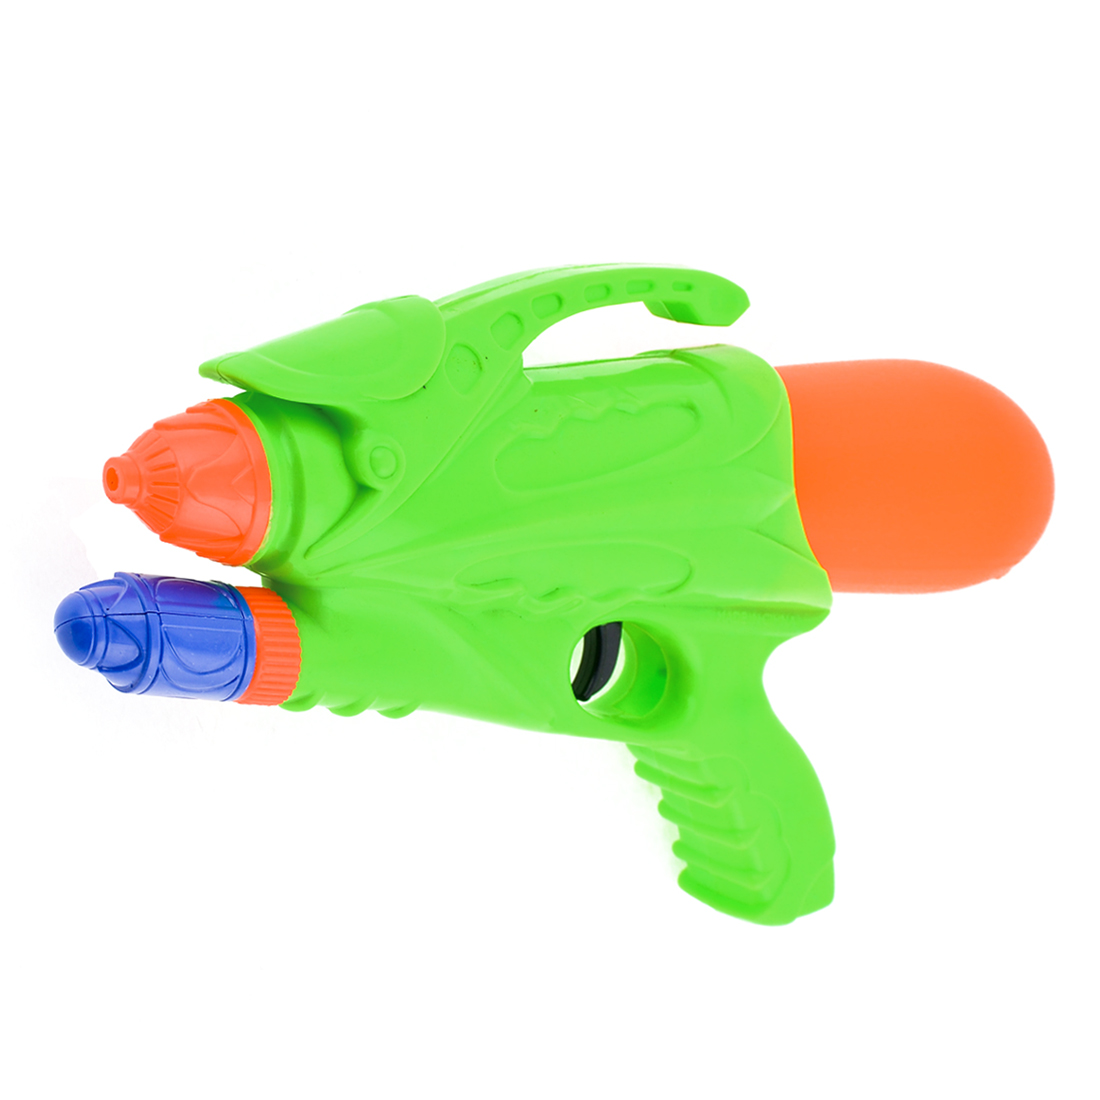 Kids Orange Red Green Pump Action Plastic Game Fun Squirt Fighting Water Gun